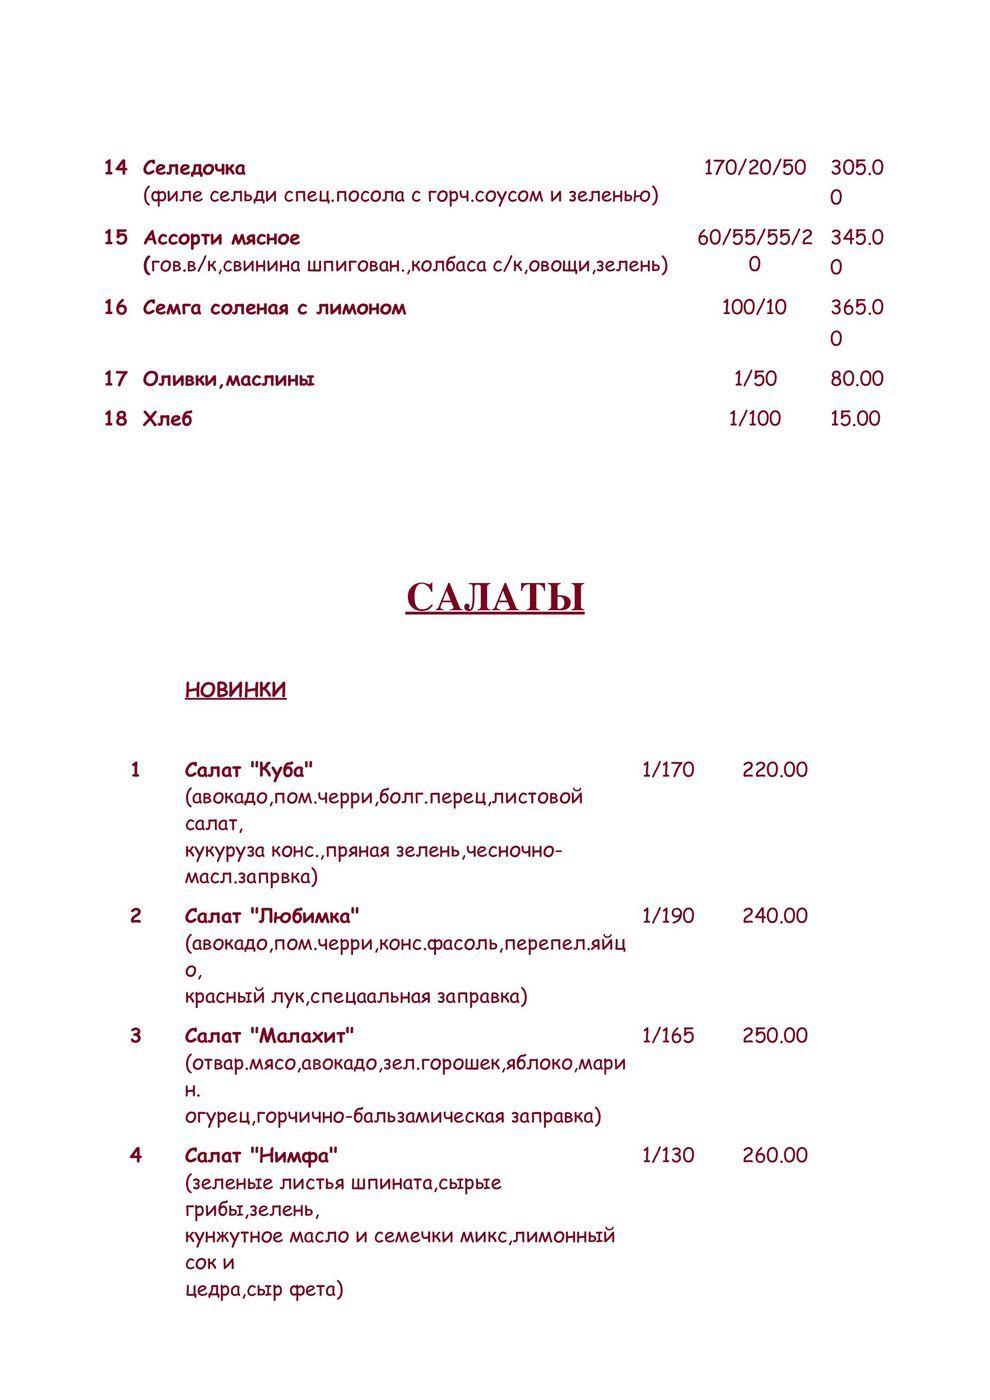 Меню кафе Мельба на улице Кирова фото 2